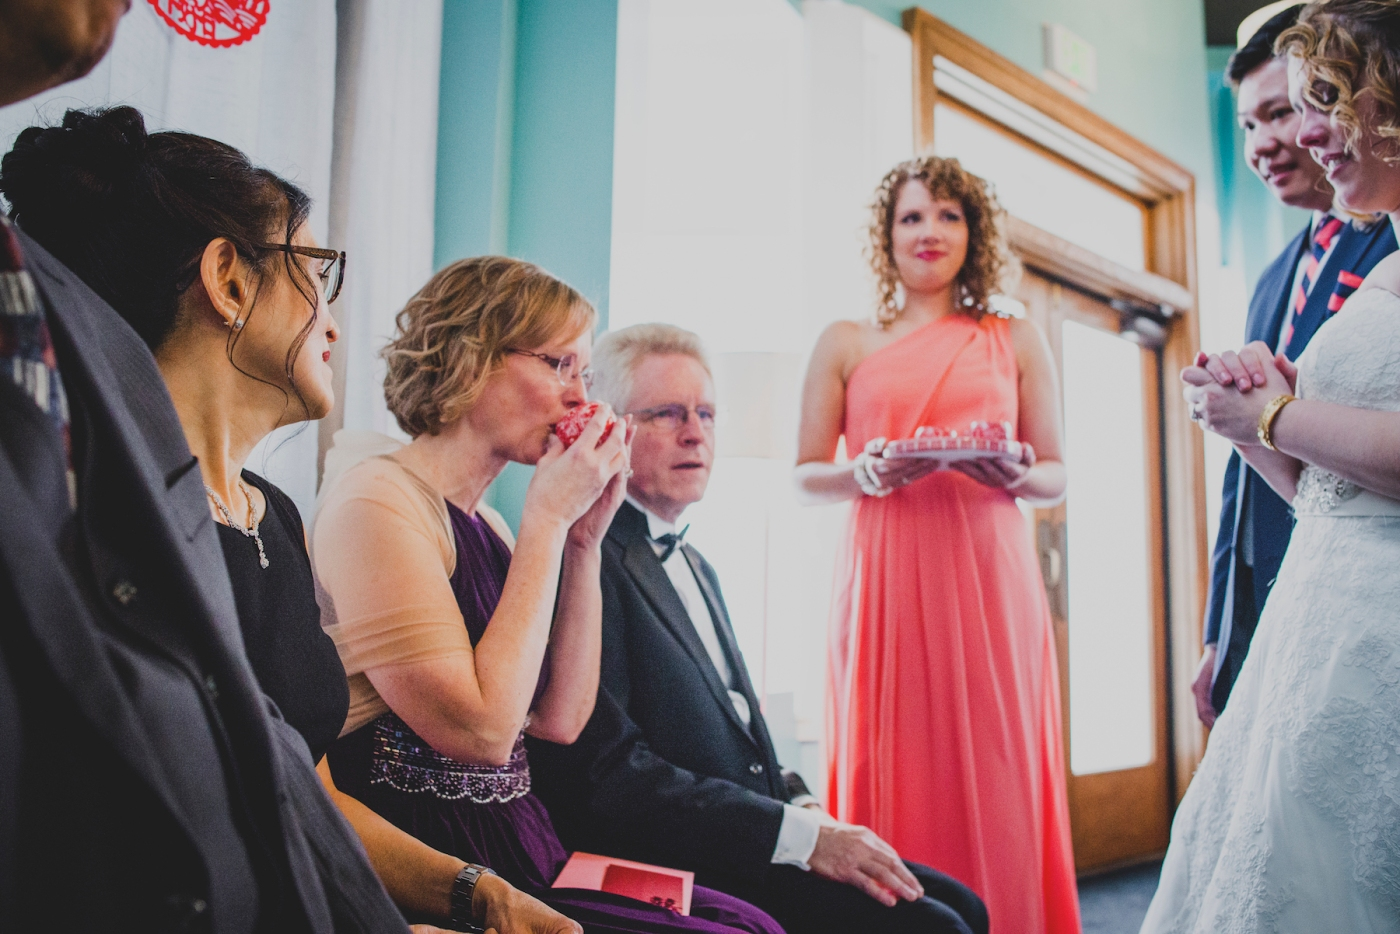 DSC_2991Everett_Wedding_Ballroom_Jane_Speleers_photography_Rachel_and_Edmund_teaceremony_2017